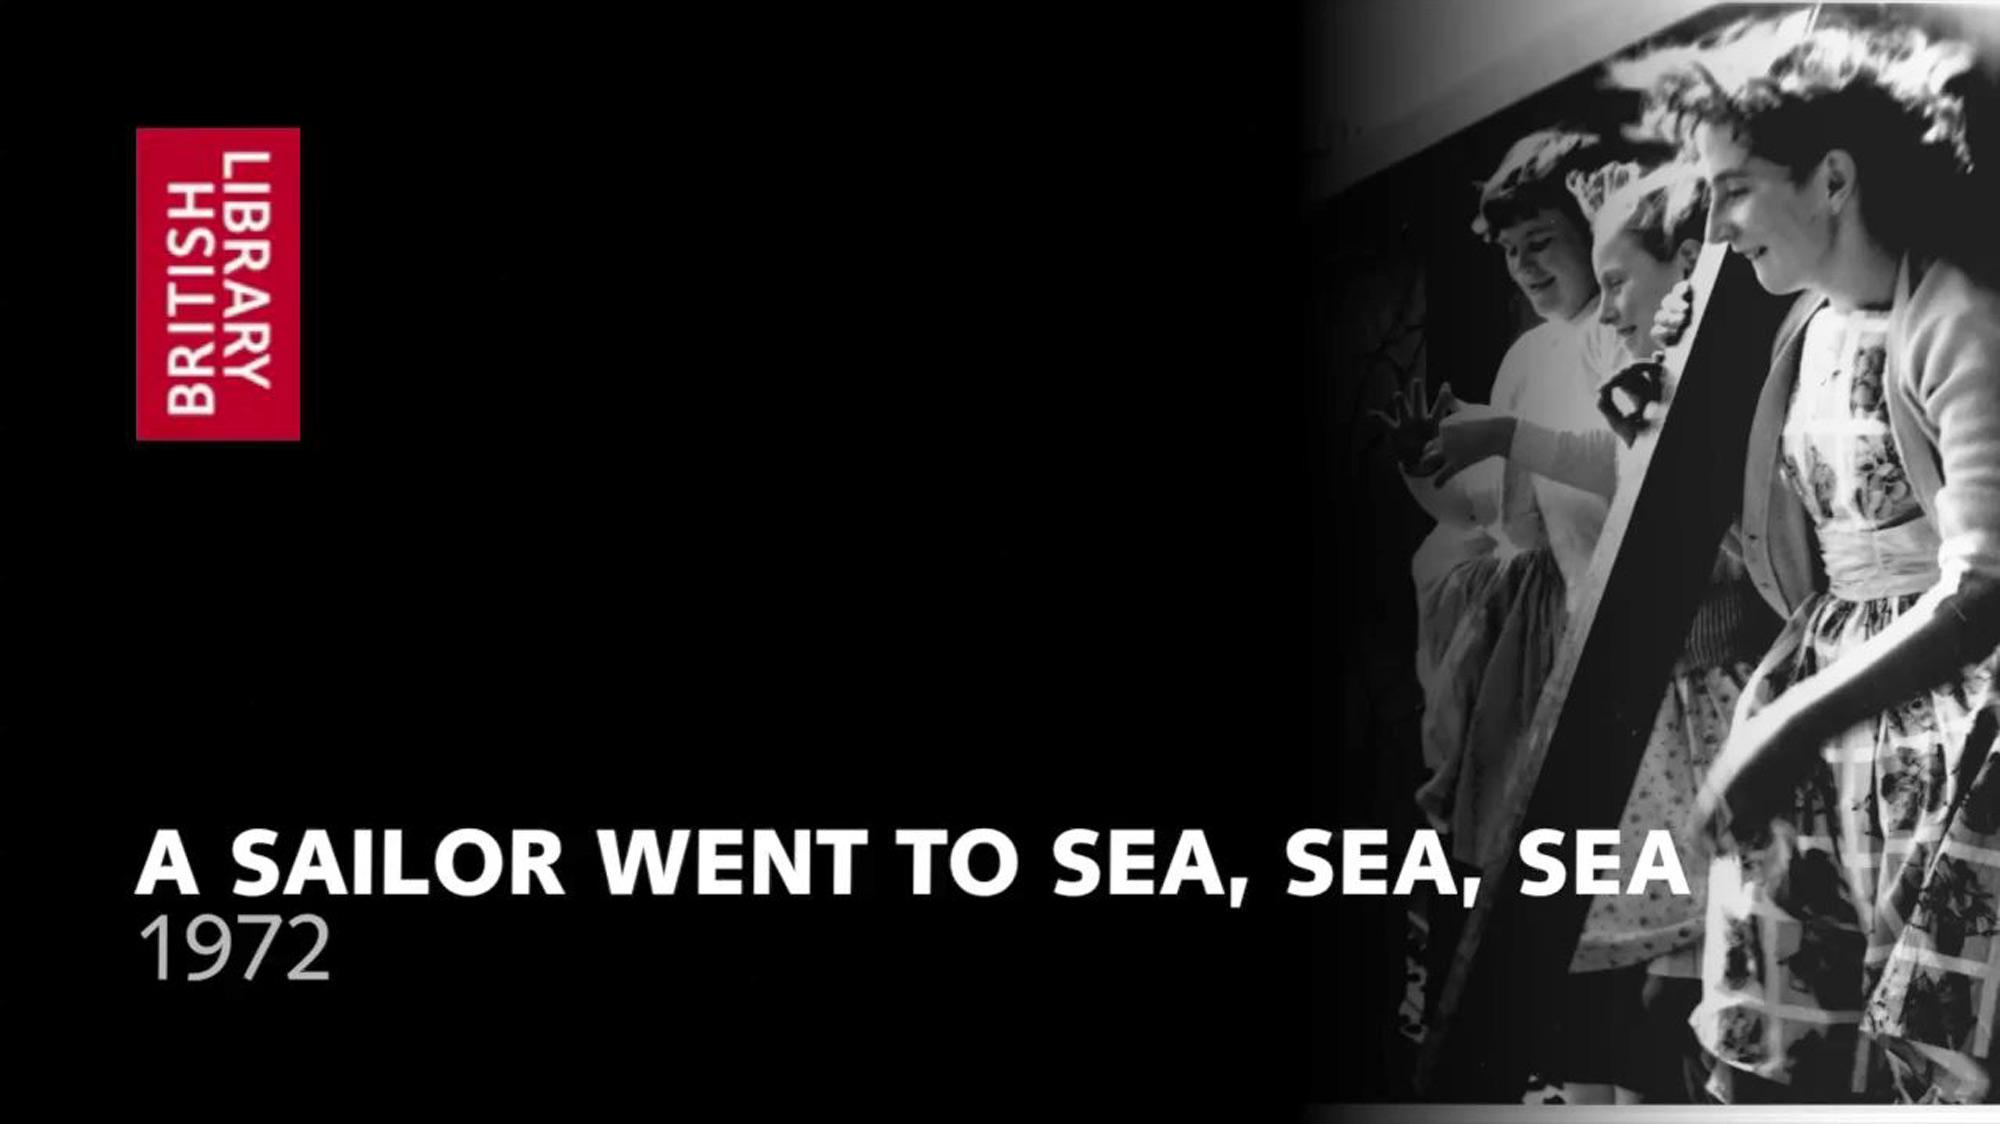 A sailor went to sea, sea, sea - The British Library